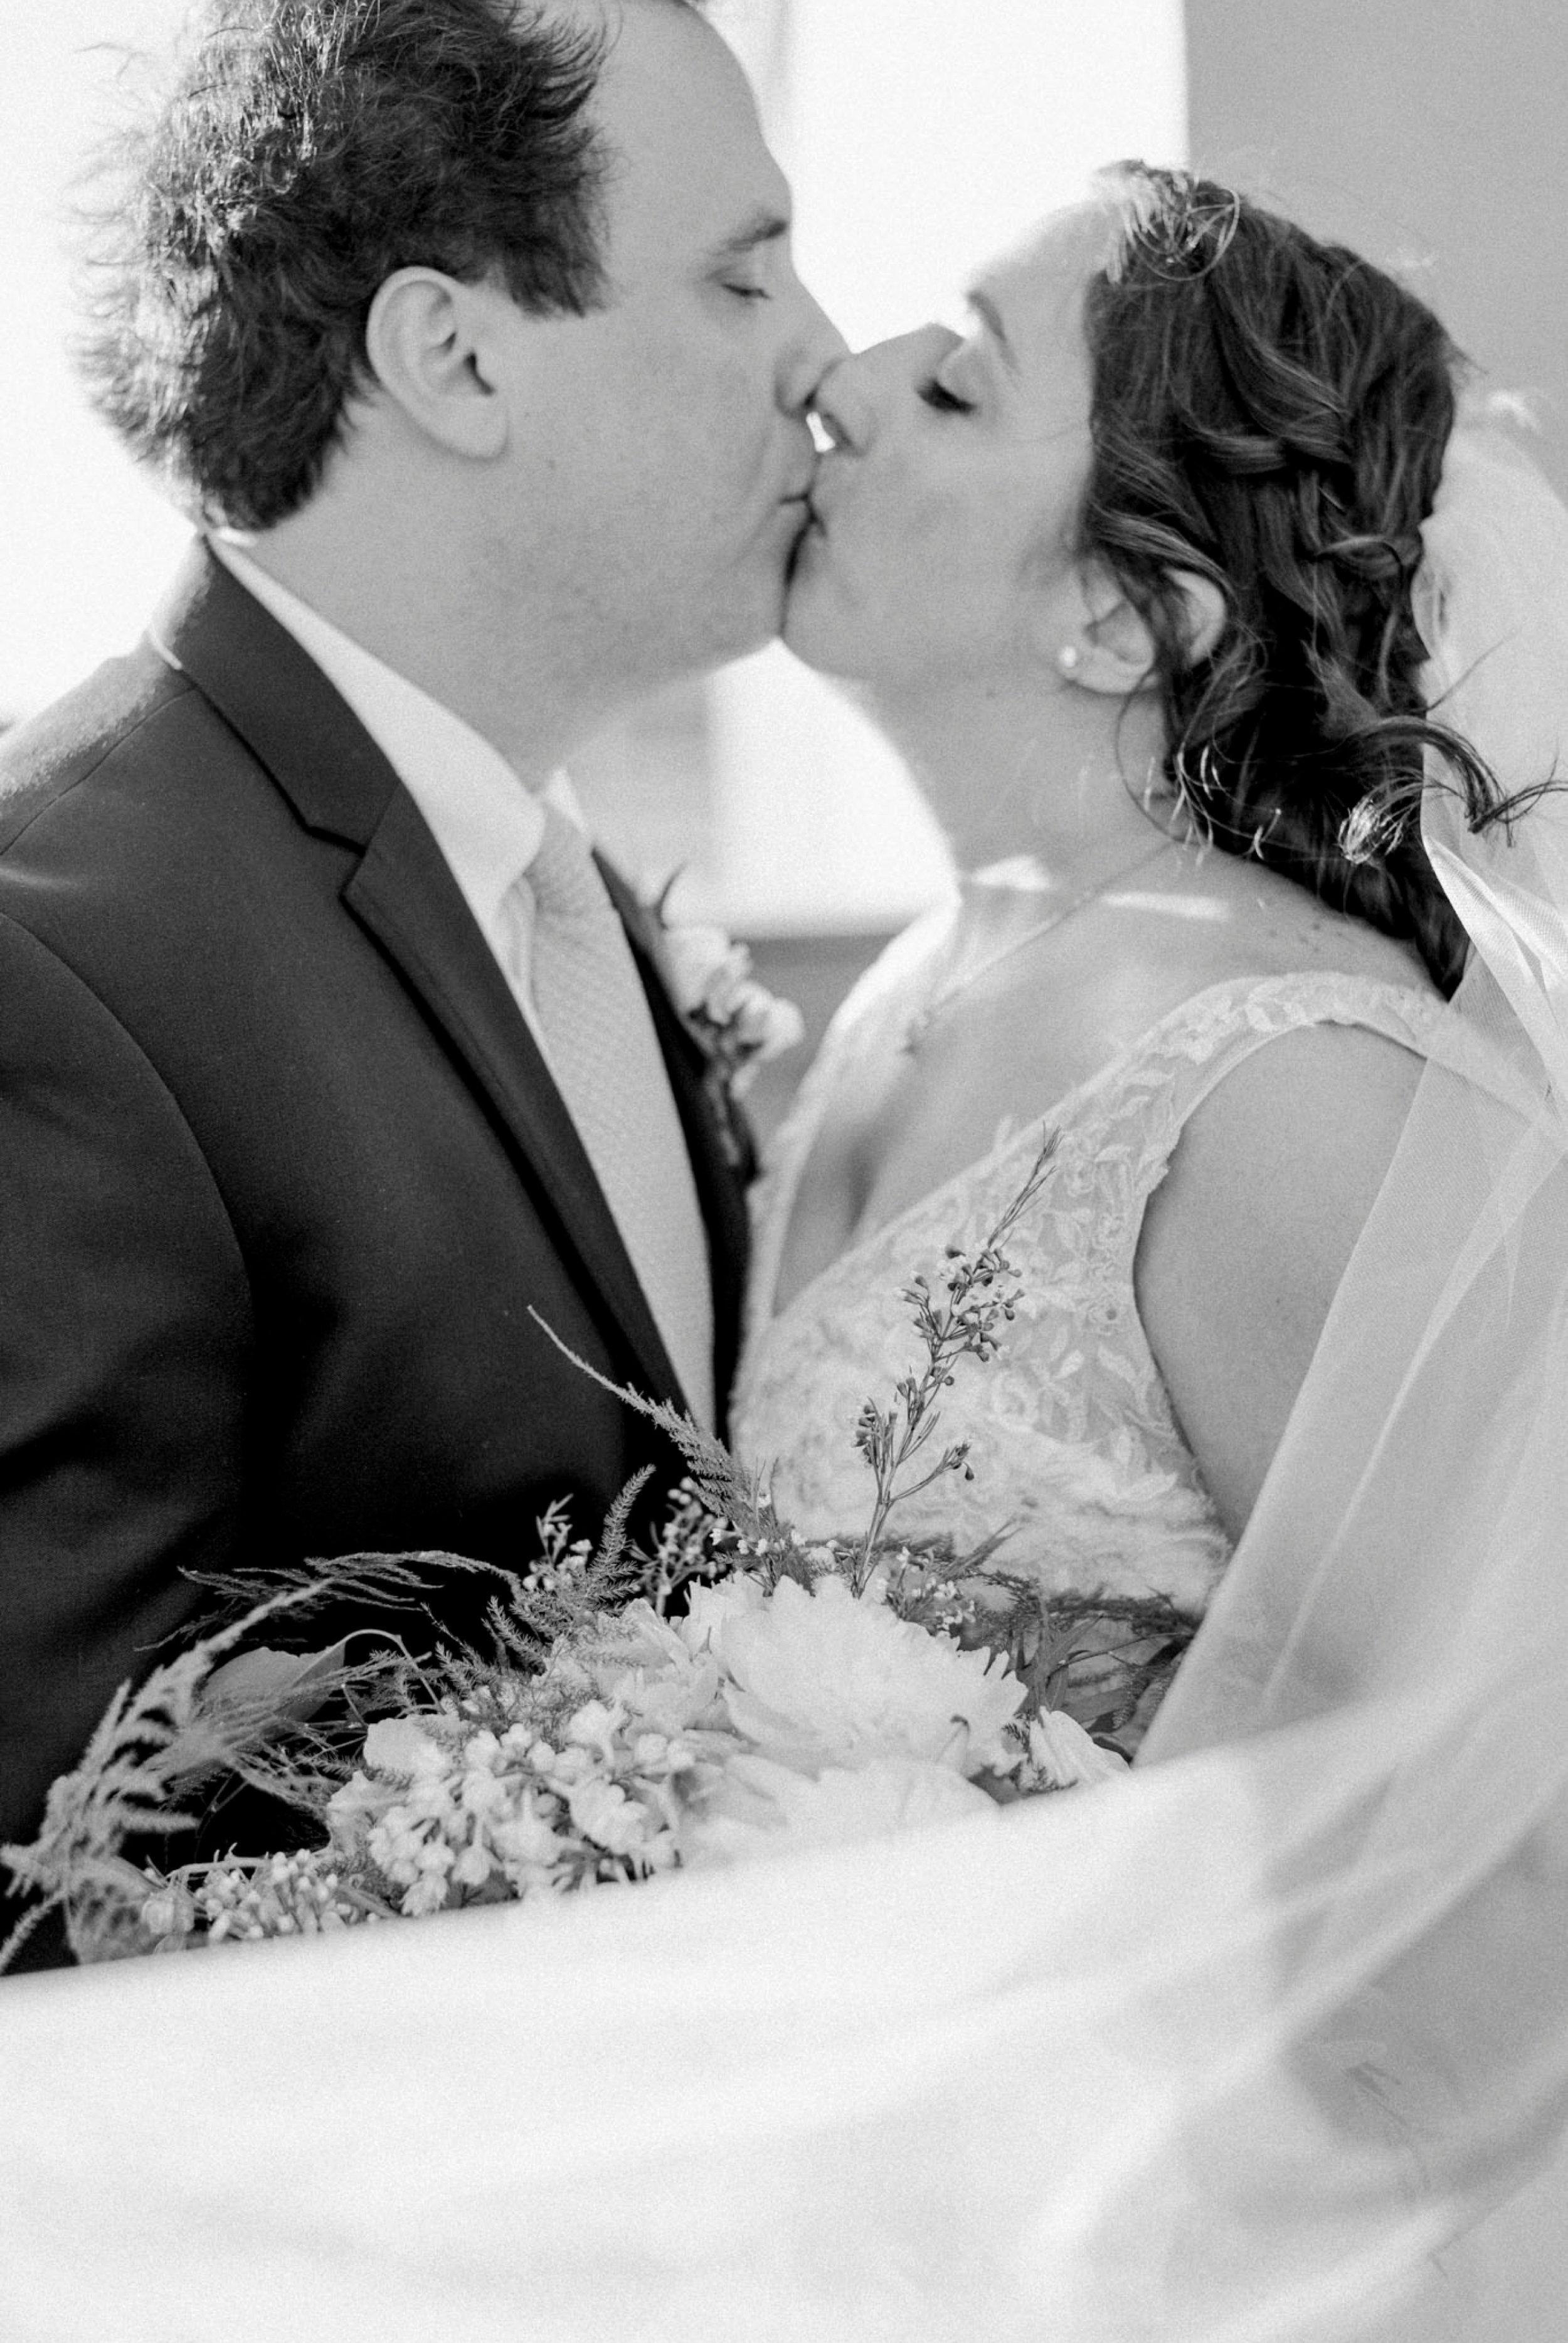 TheVirginianHotel_LynchburgVA_TheVirginianHotelWedding_Virginiaweddingphotographer_Lynchburgvawedding 43.jpg